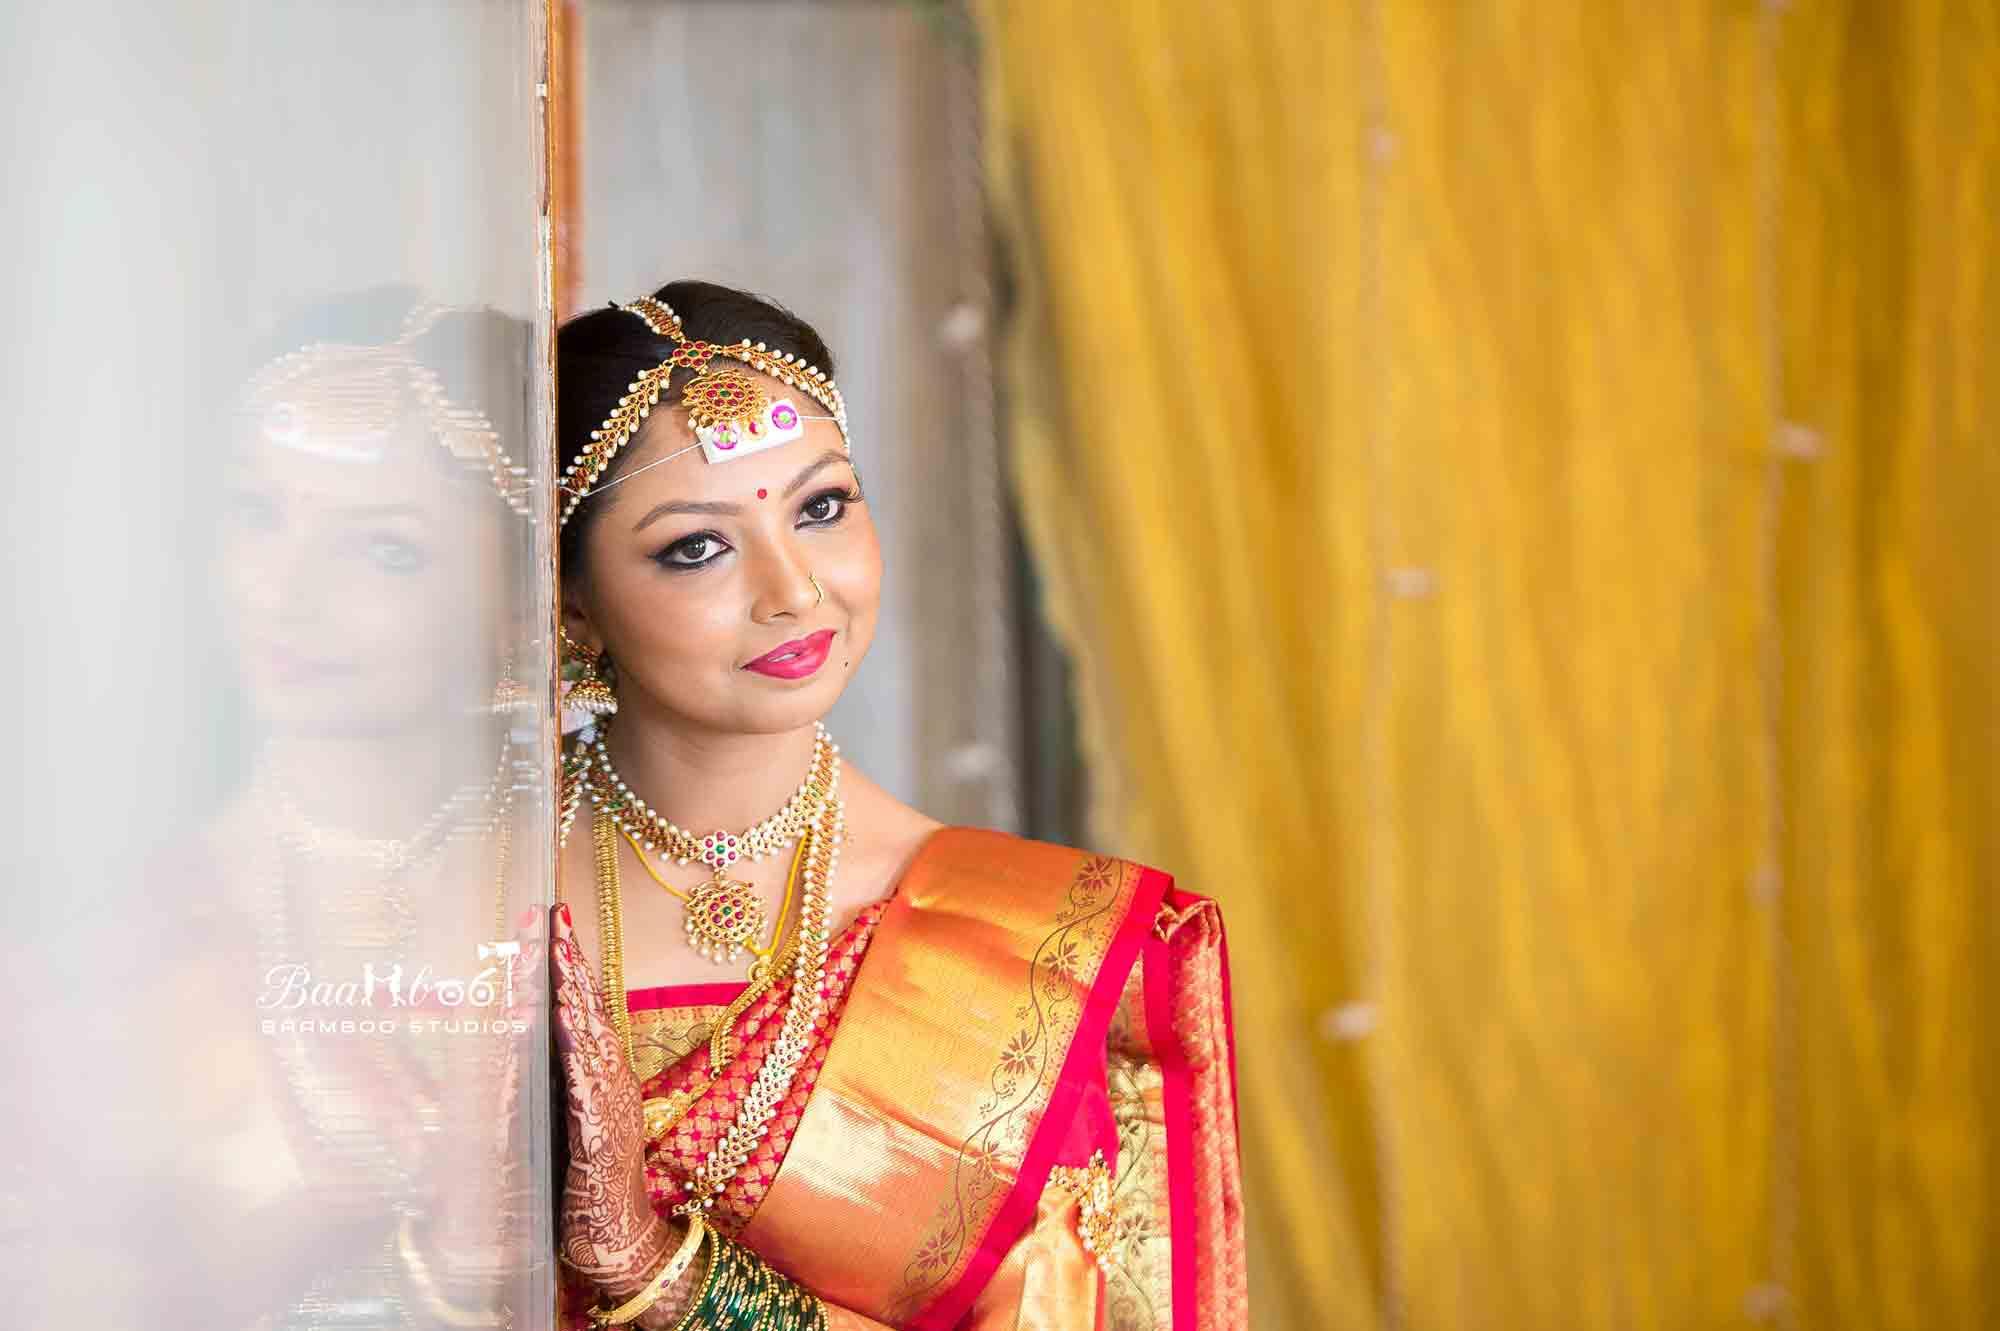 Prasanna & Mythri